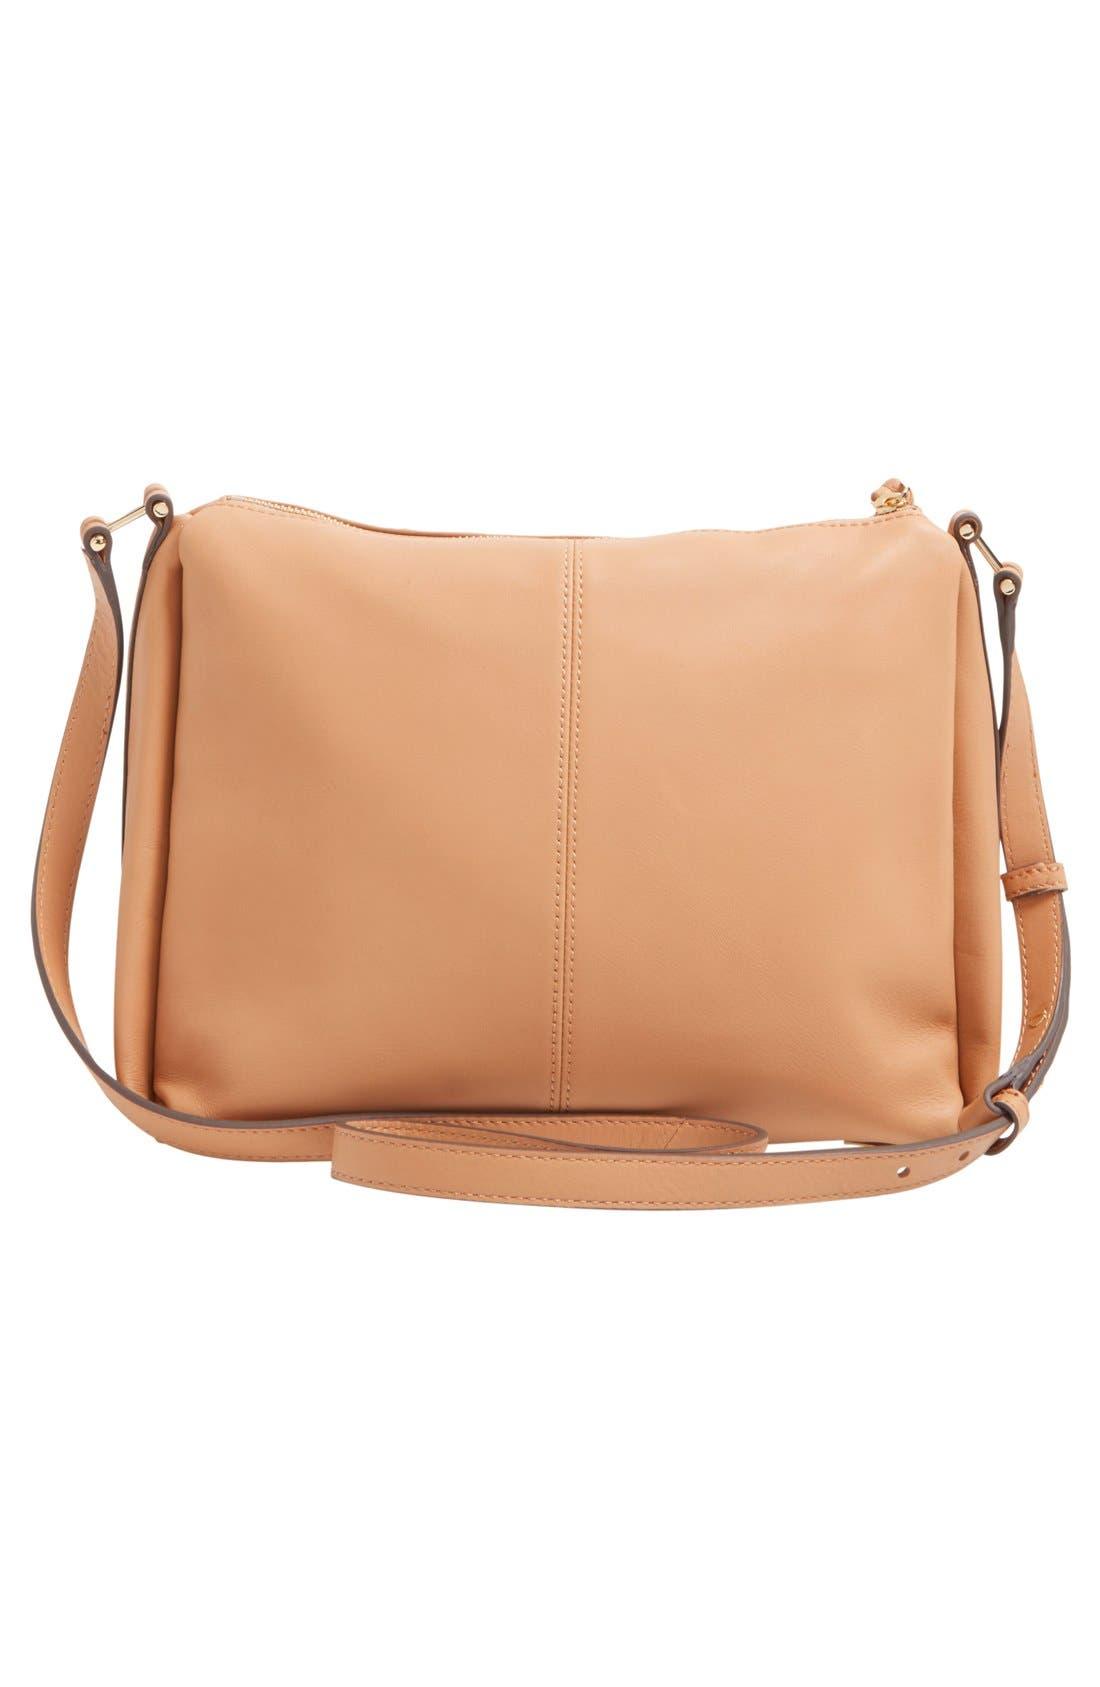 Alternate Image 3  - Vince Camuto 'Josie' Crossbody Bag